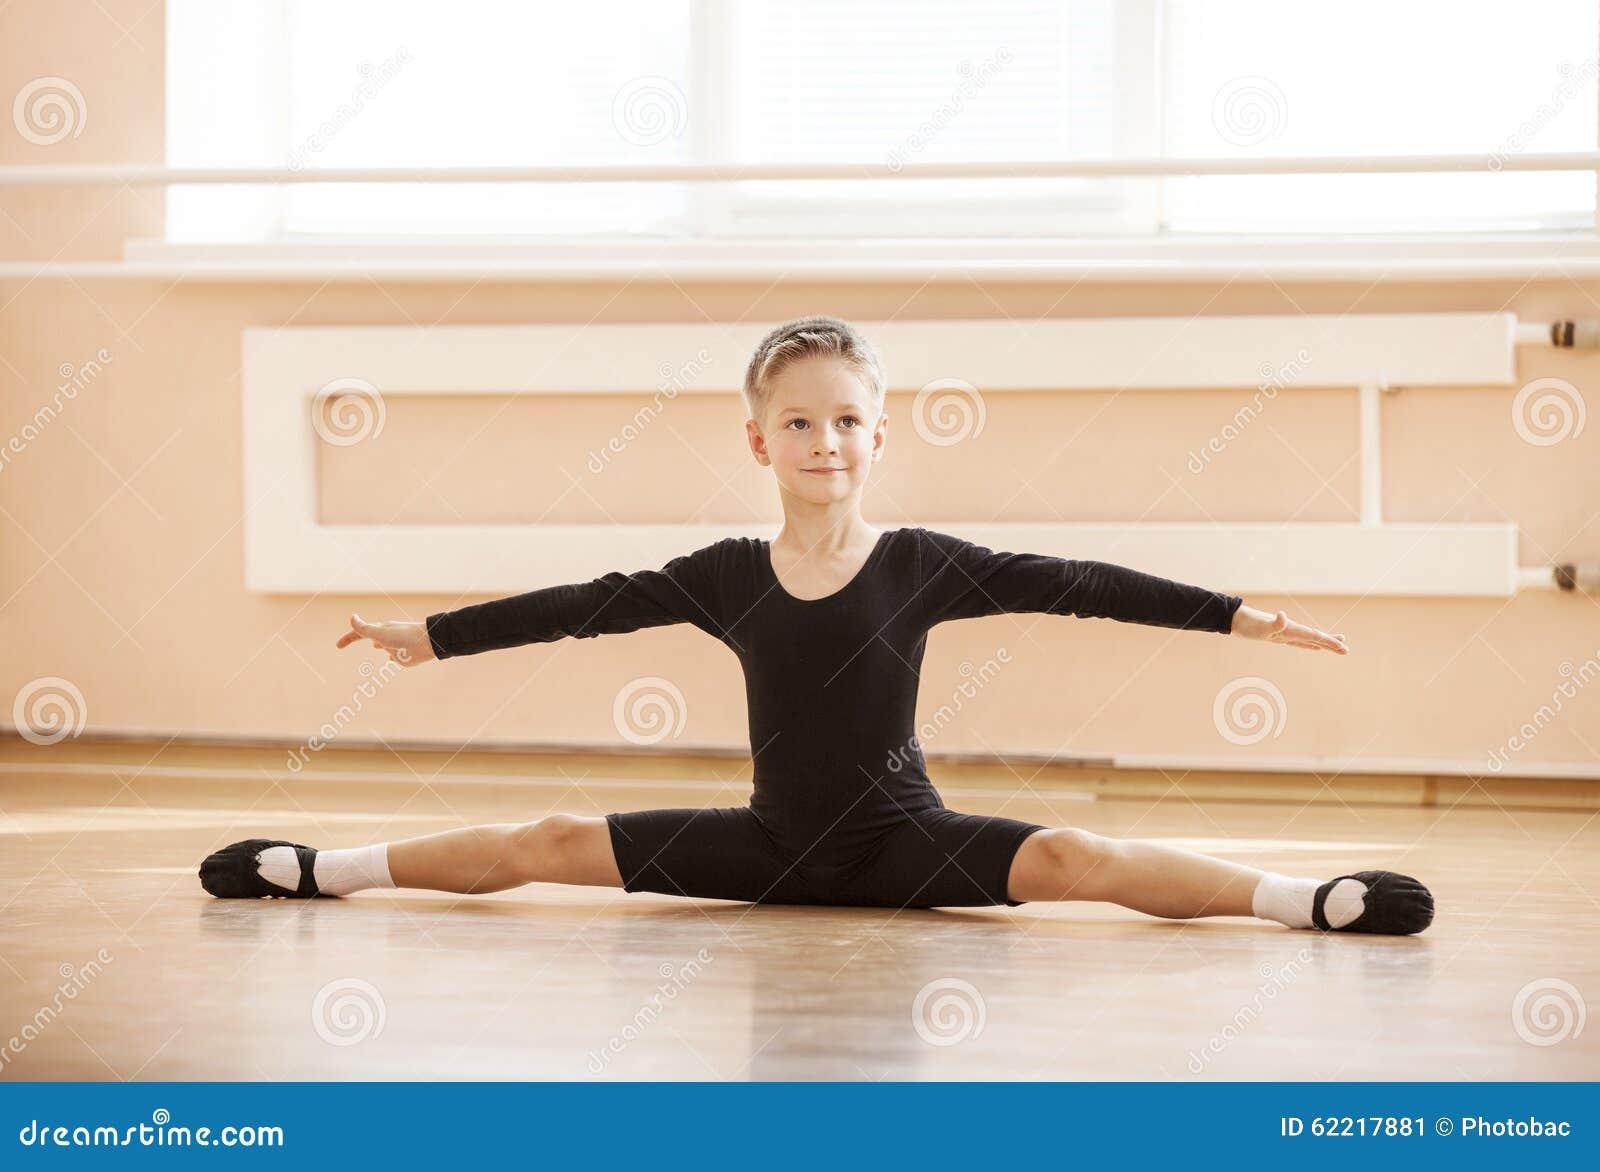 Aerobics dance 3d - 3 3